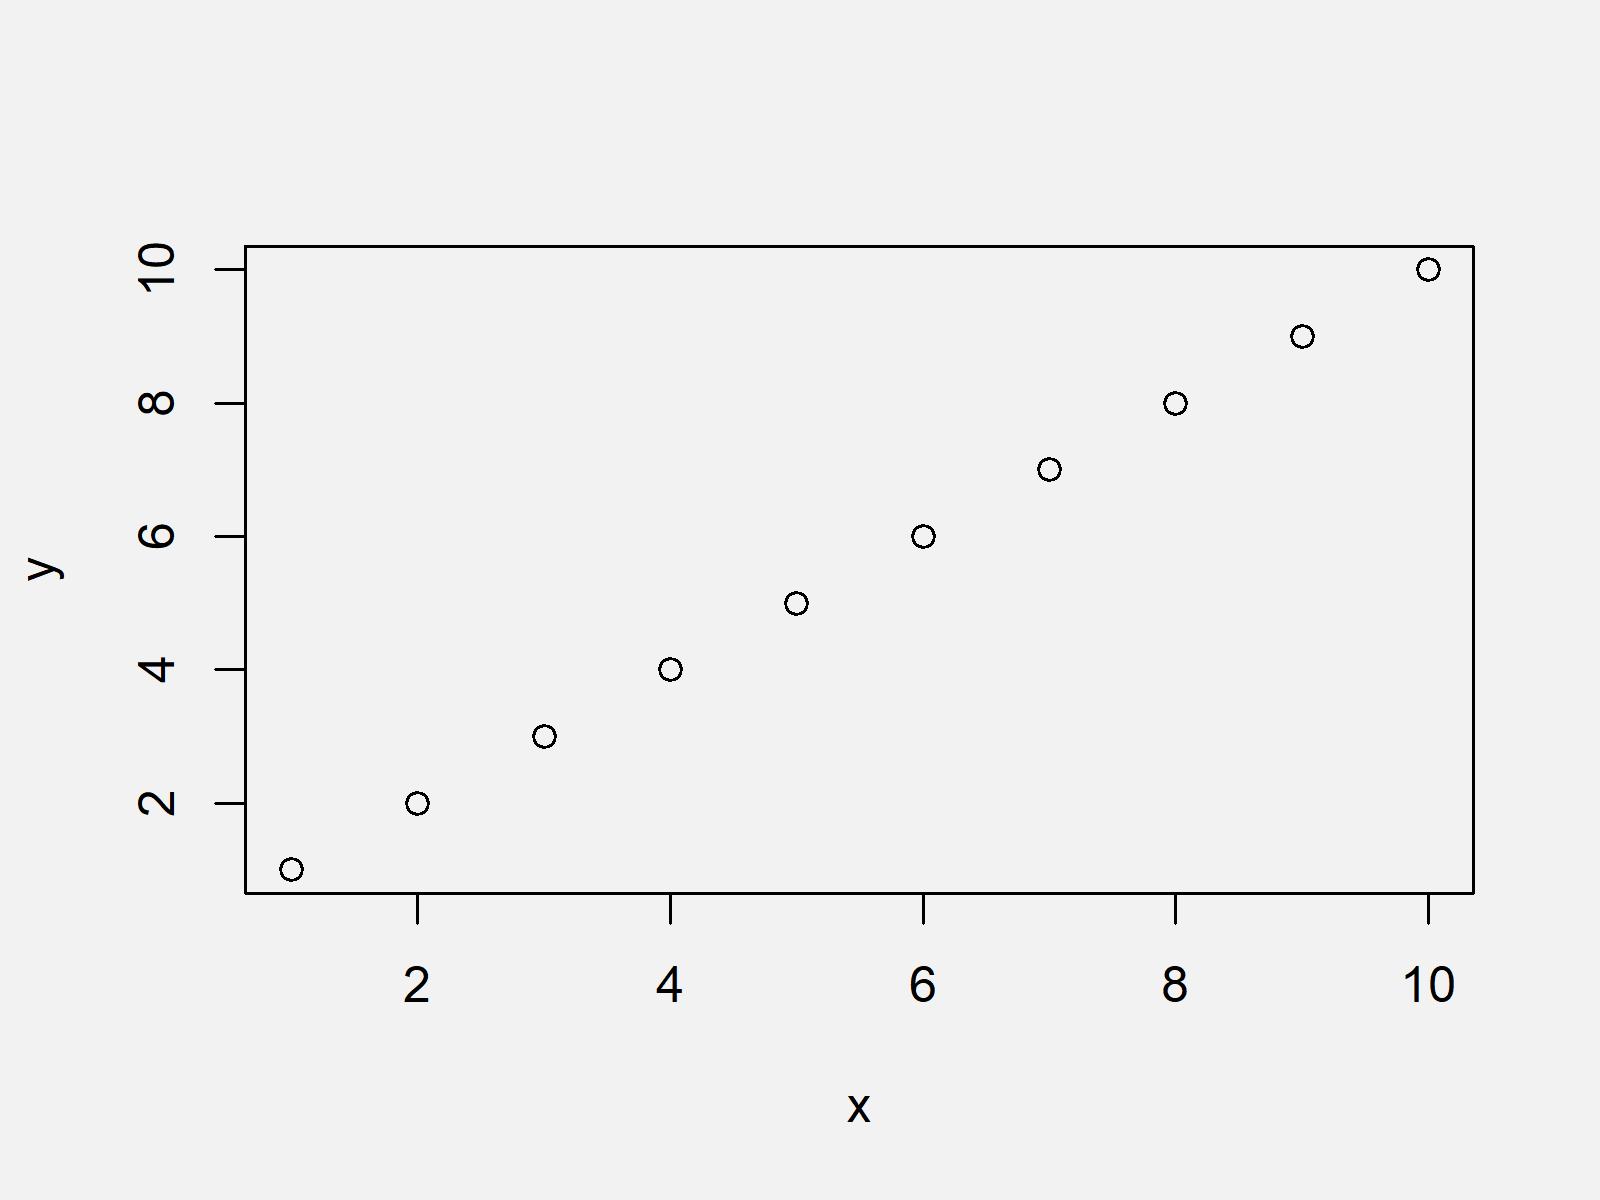 r graph figure 1 plot actual values as axis ticks r